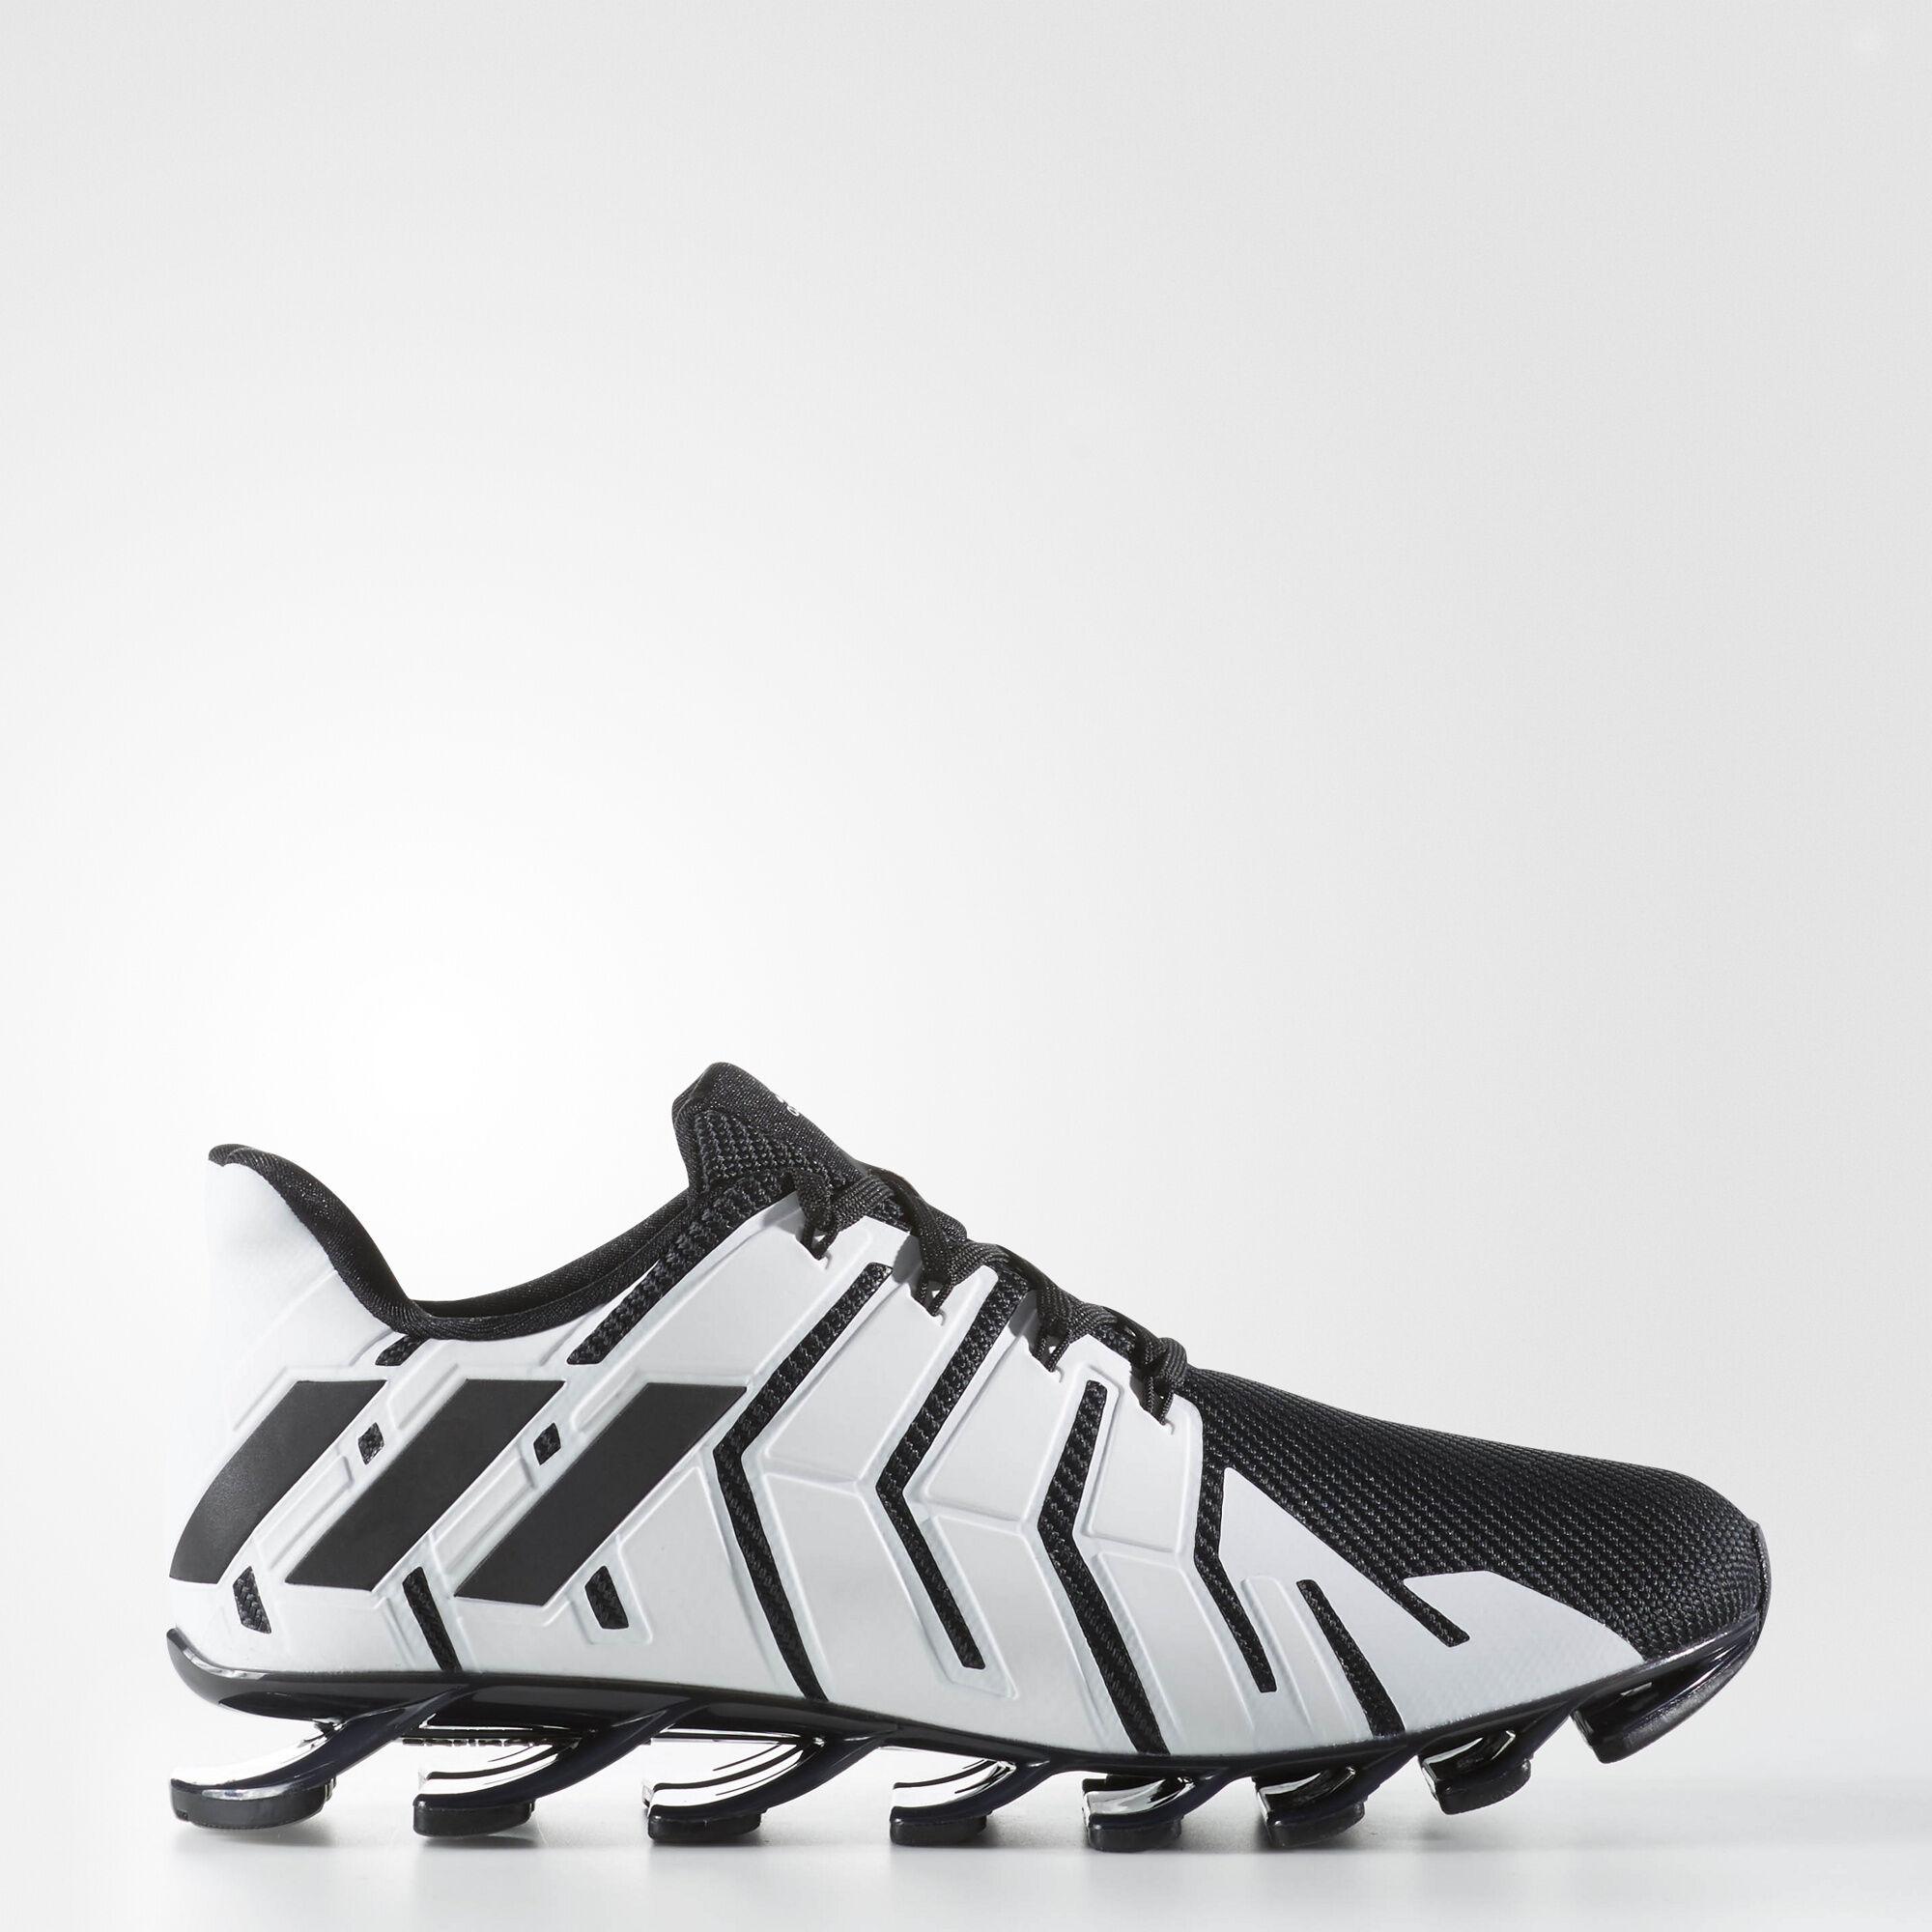 new style 0cc3f 232a2 mens adidas springblade pro white